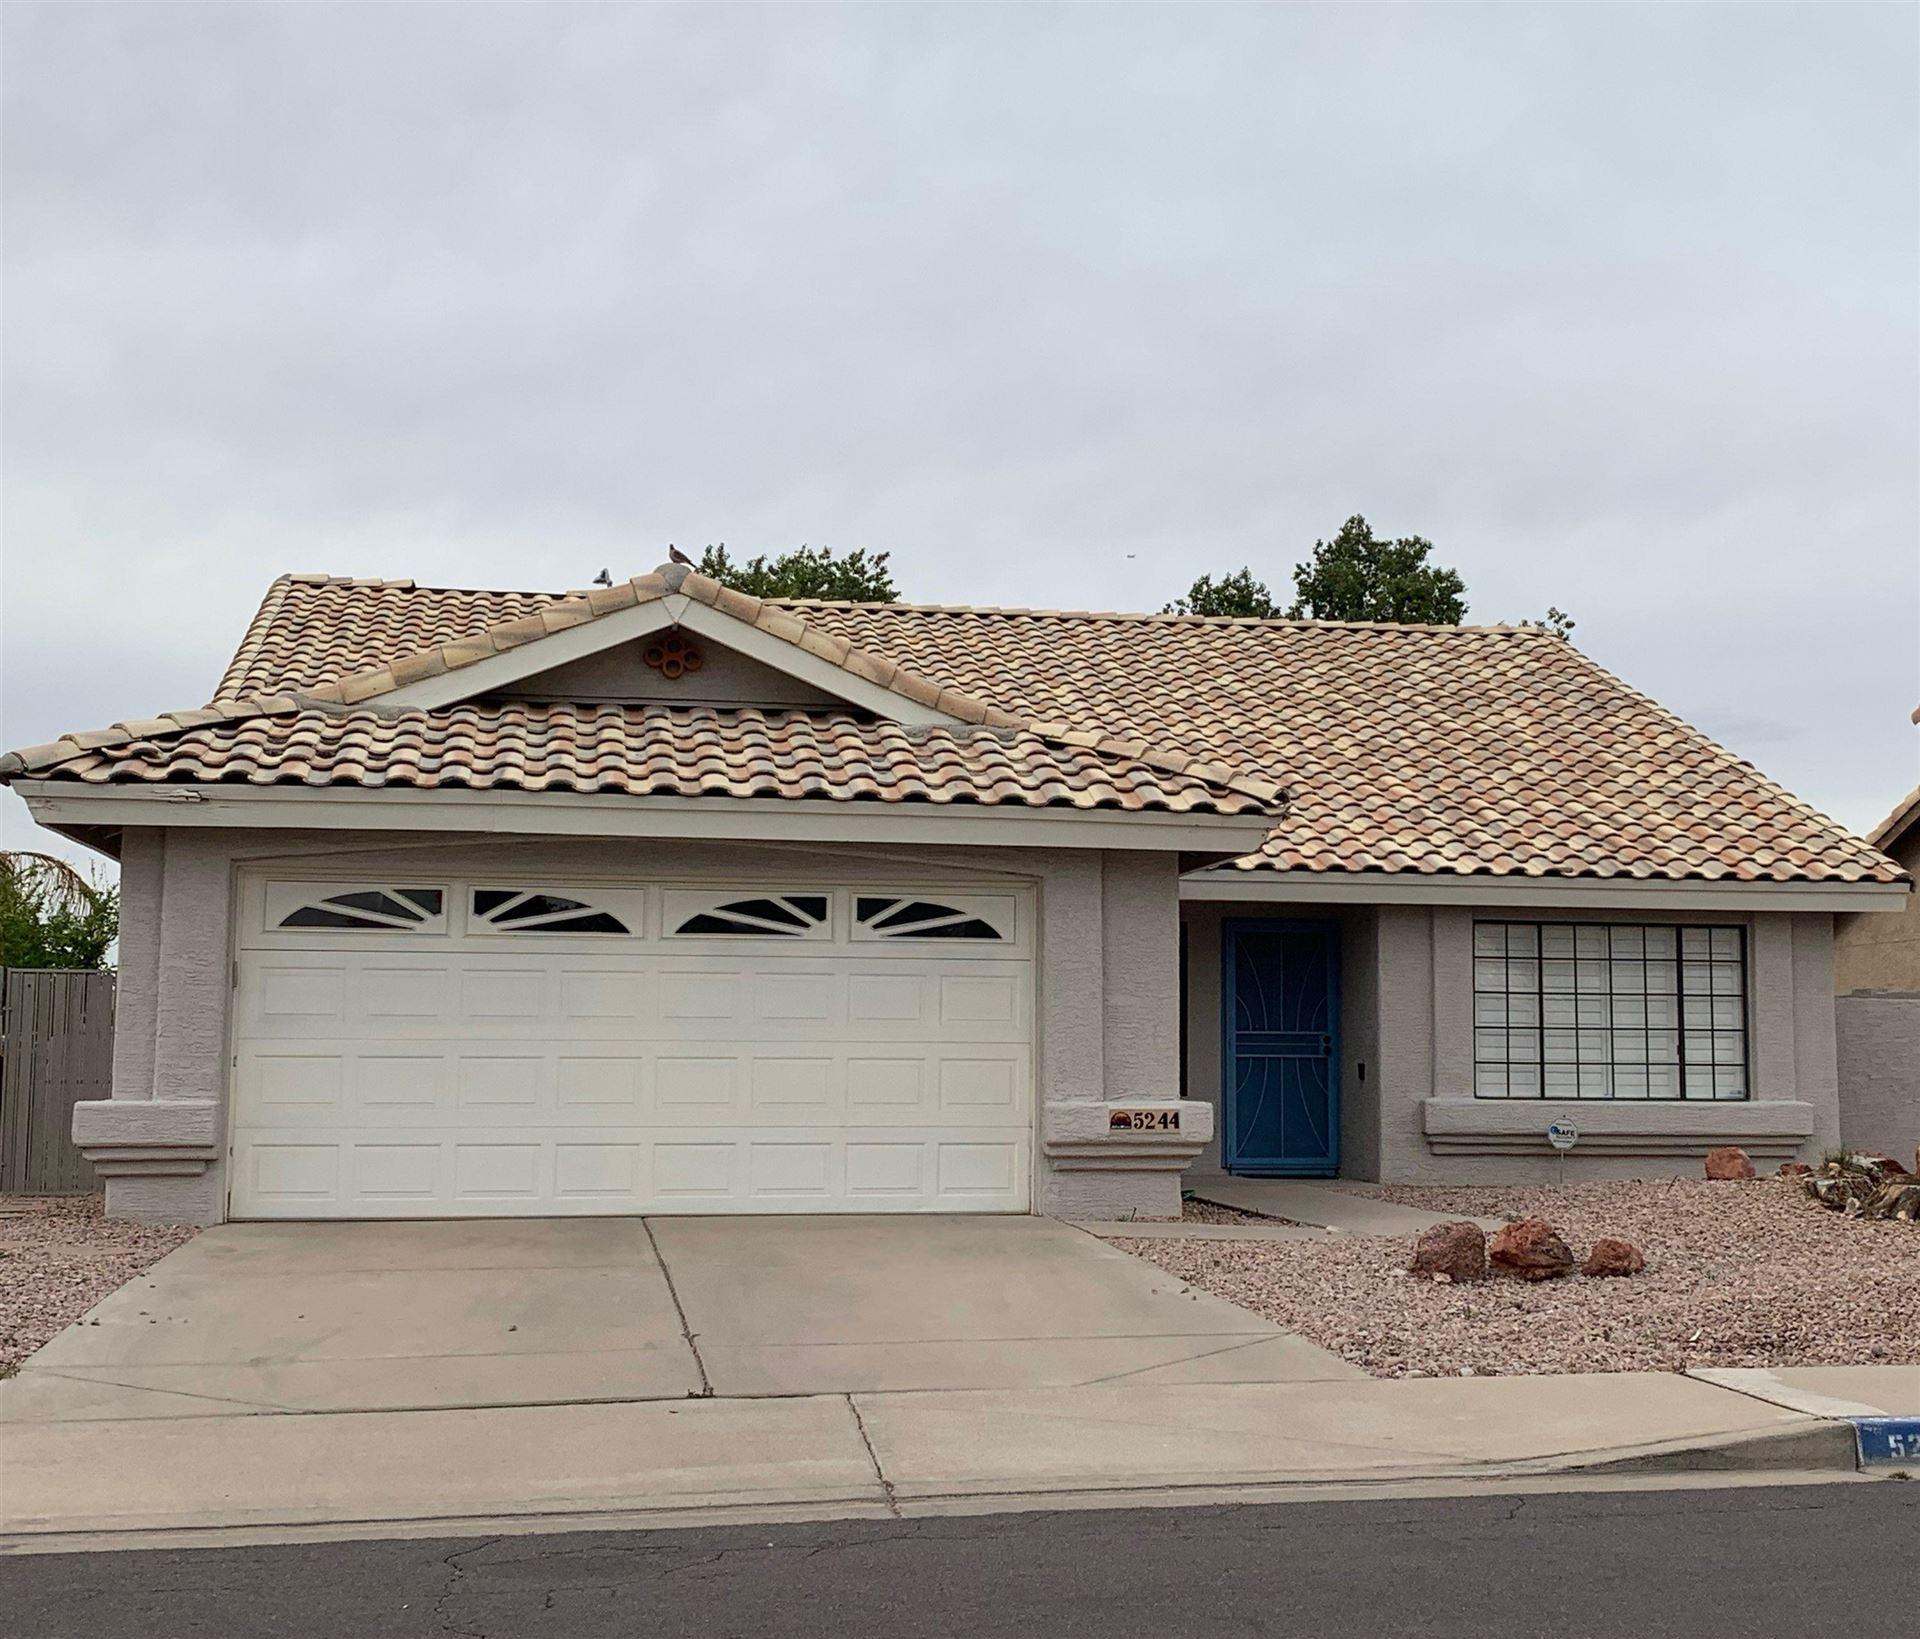 5244 E HANNIBAL Street, Mesa, AZ 85205 - MLS#: 6213826